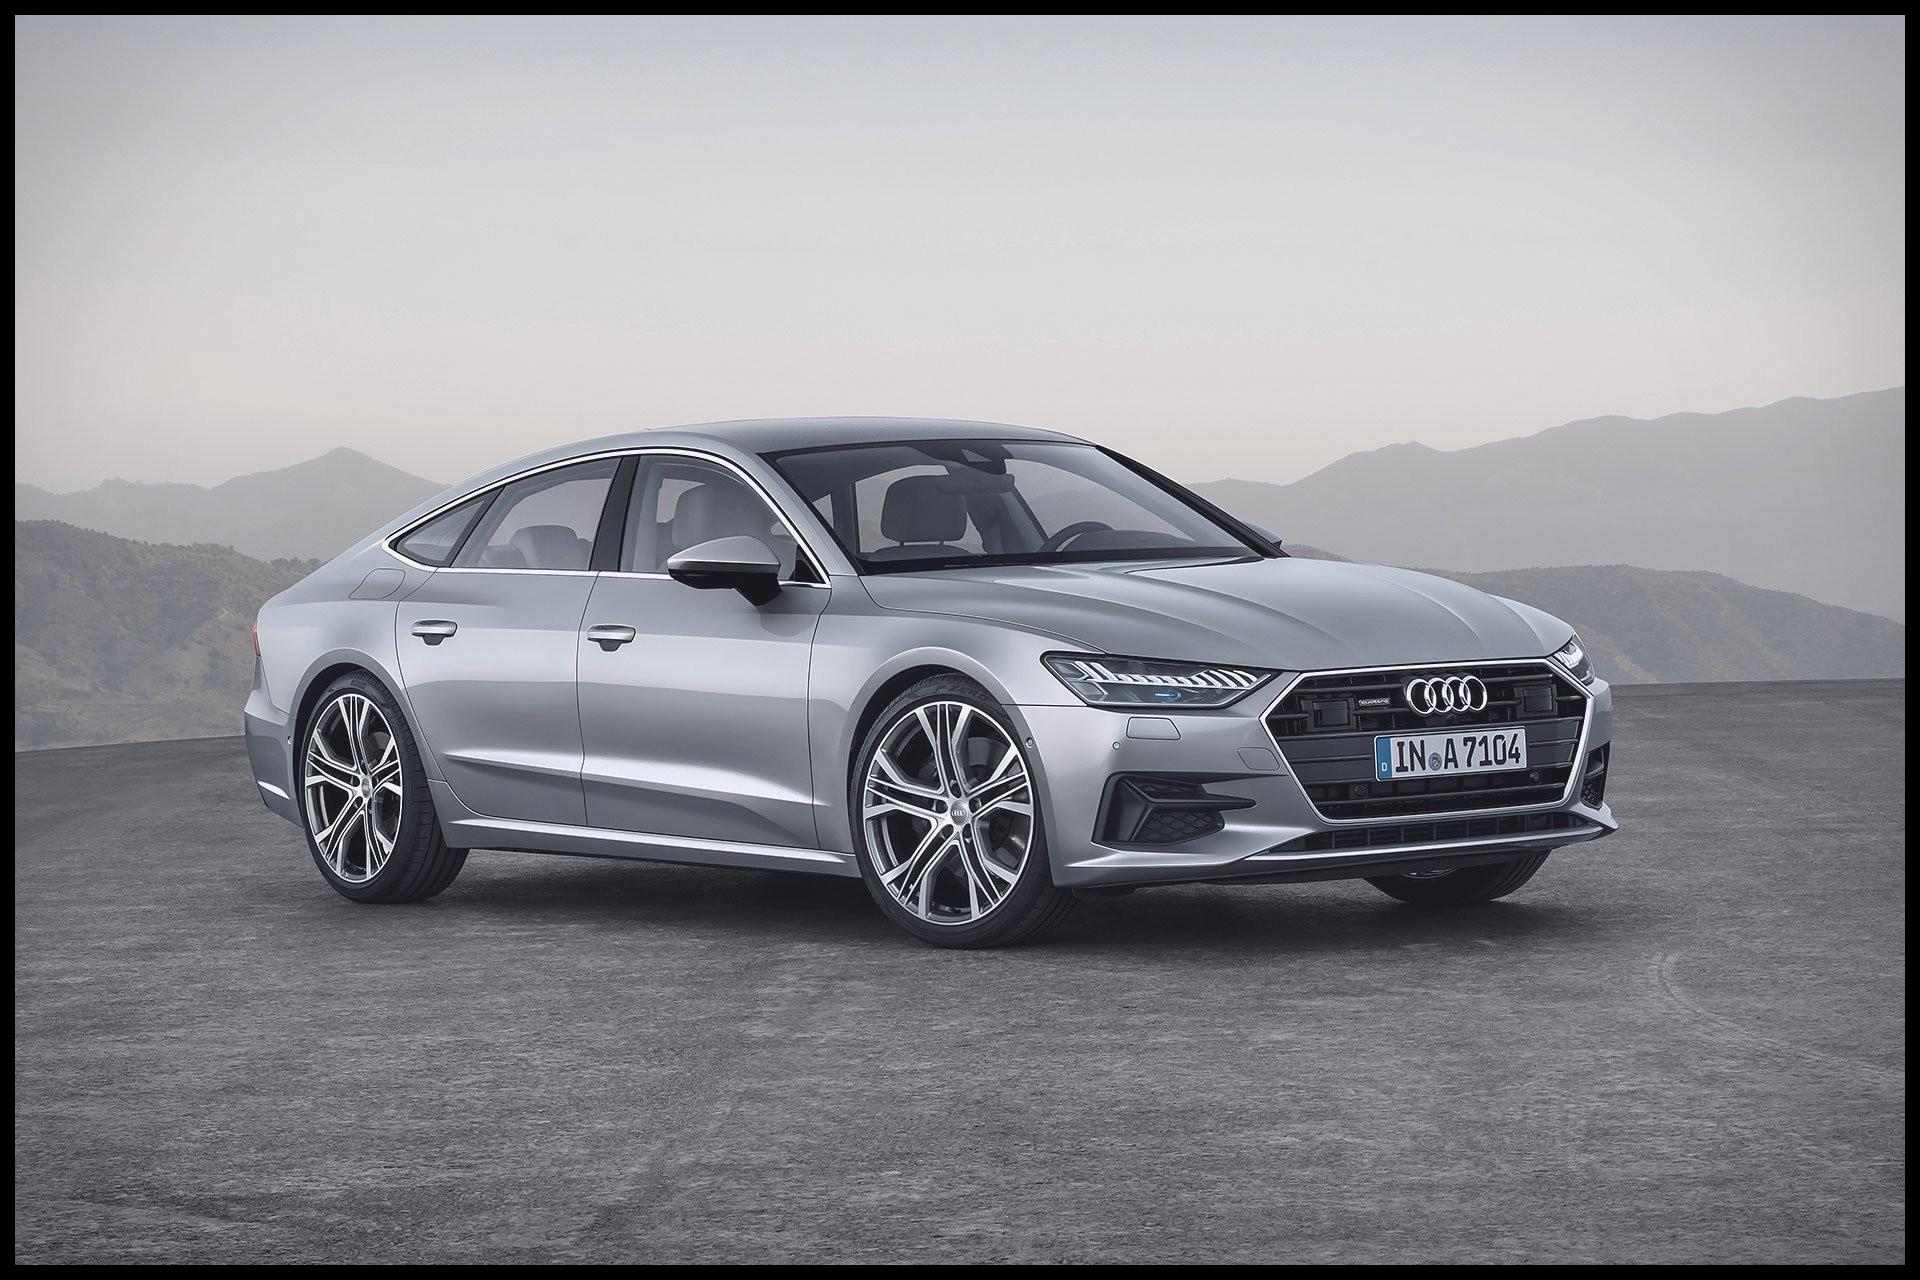 Audi 2019 A7 2019 Audi S7 2019 Audi S7 2019 Audi A7 2018 Audi A7 Sportback